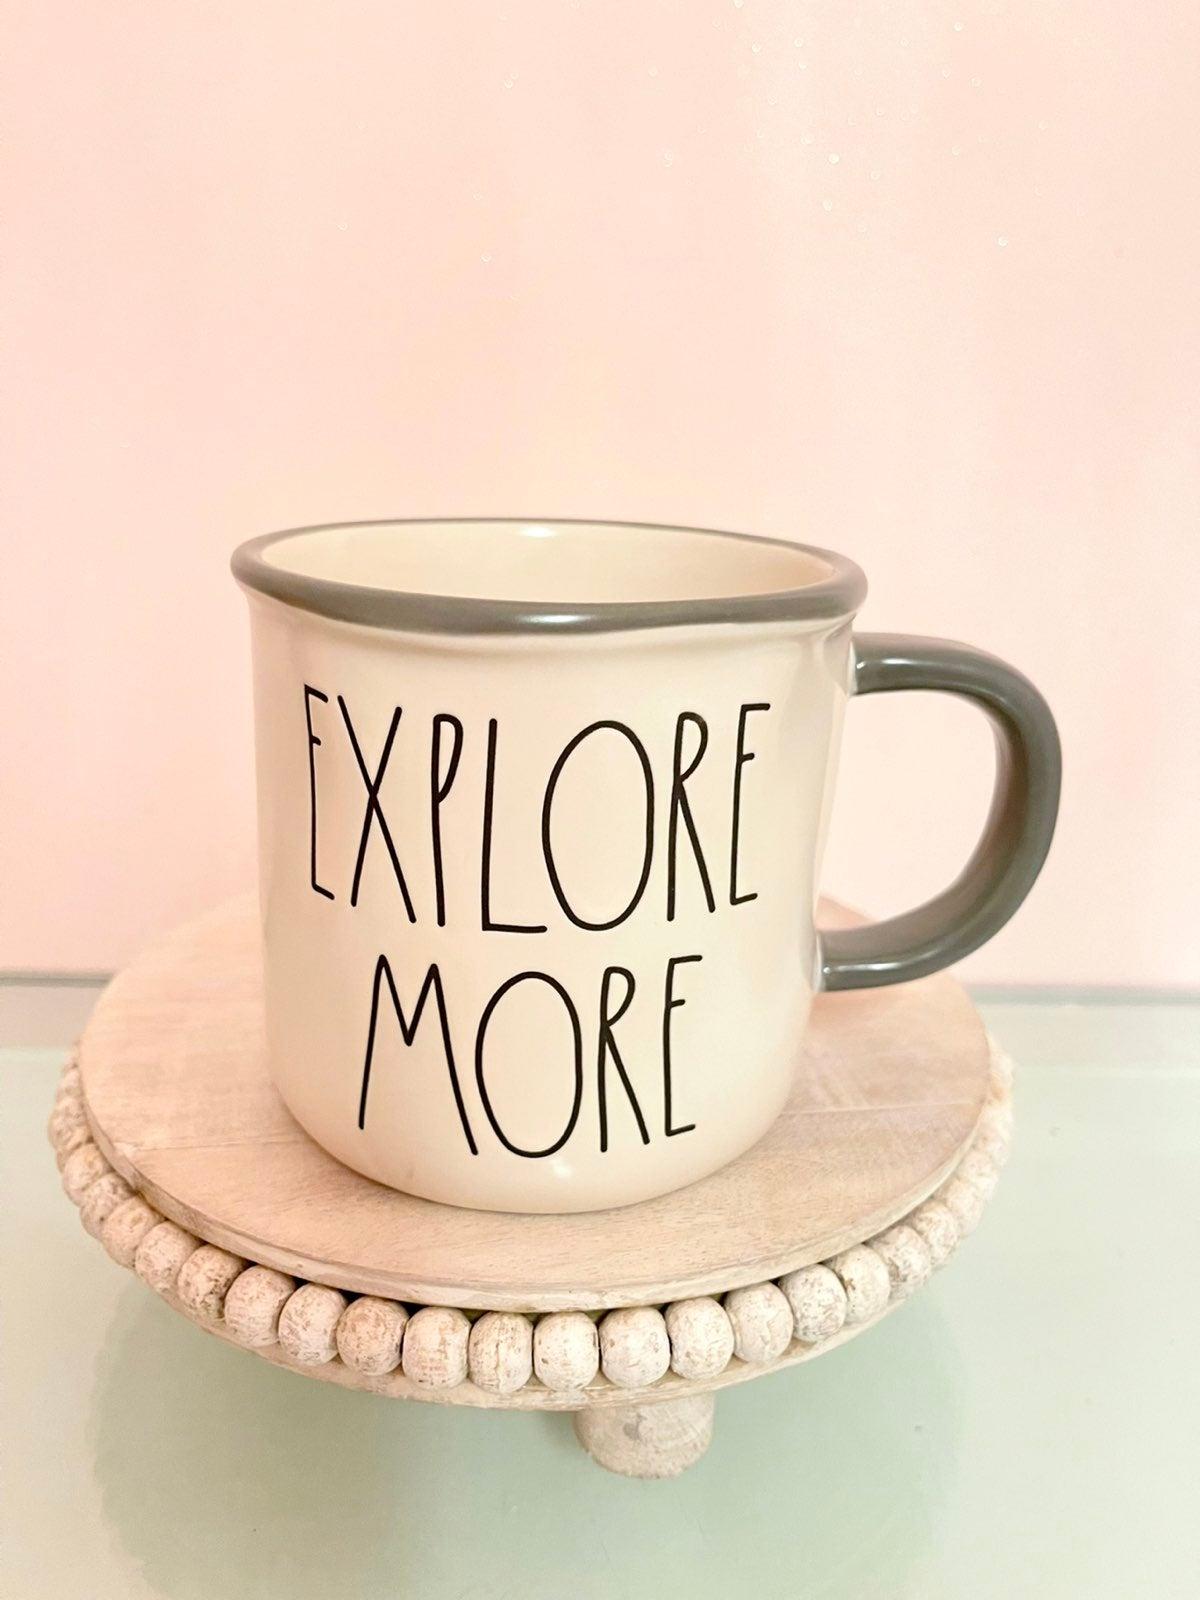 Rae Dunn mug camper mug explore more new